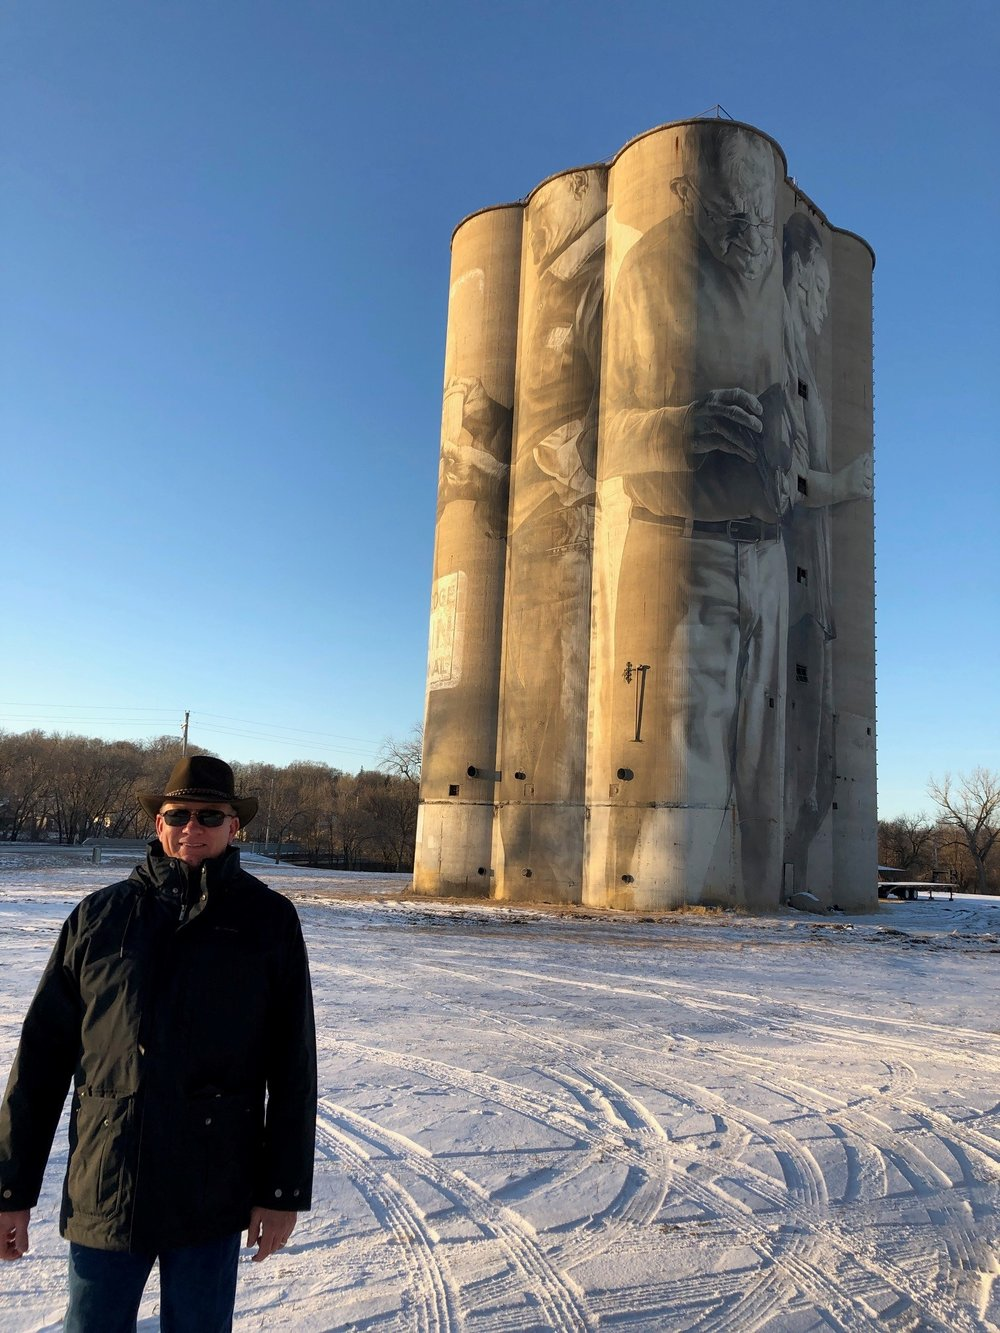 Grain silo artwork in Fort Dodge. Photo credit: Tom Oswald